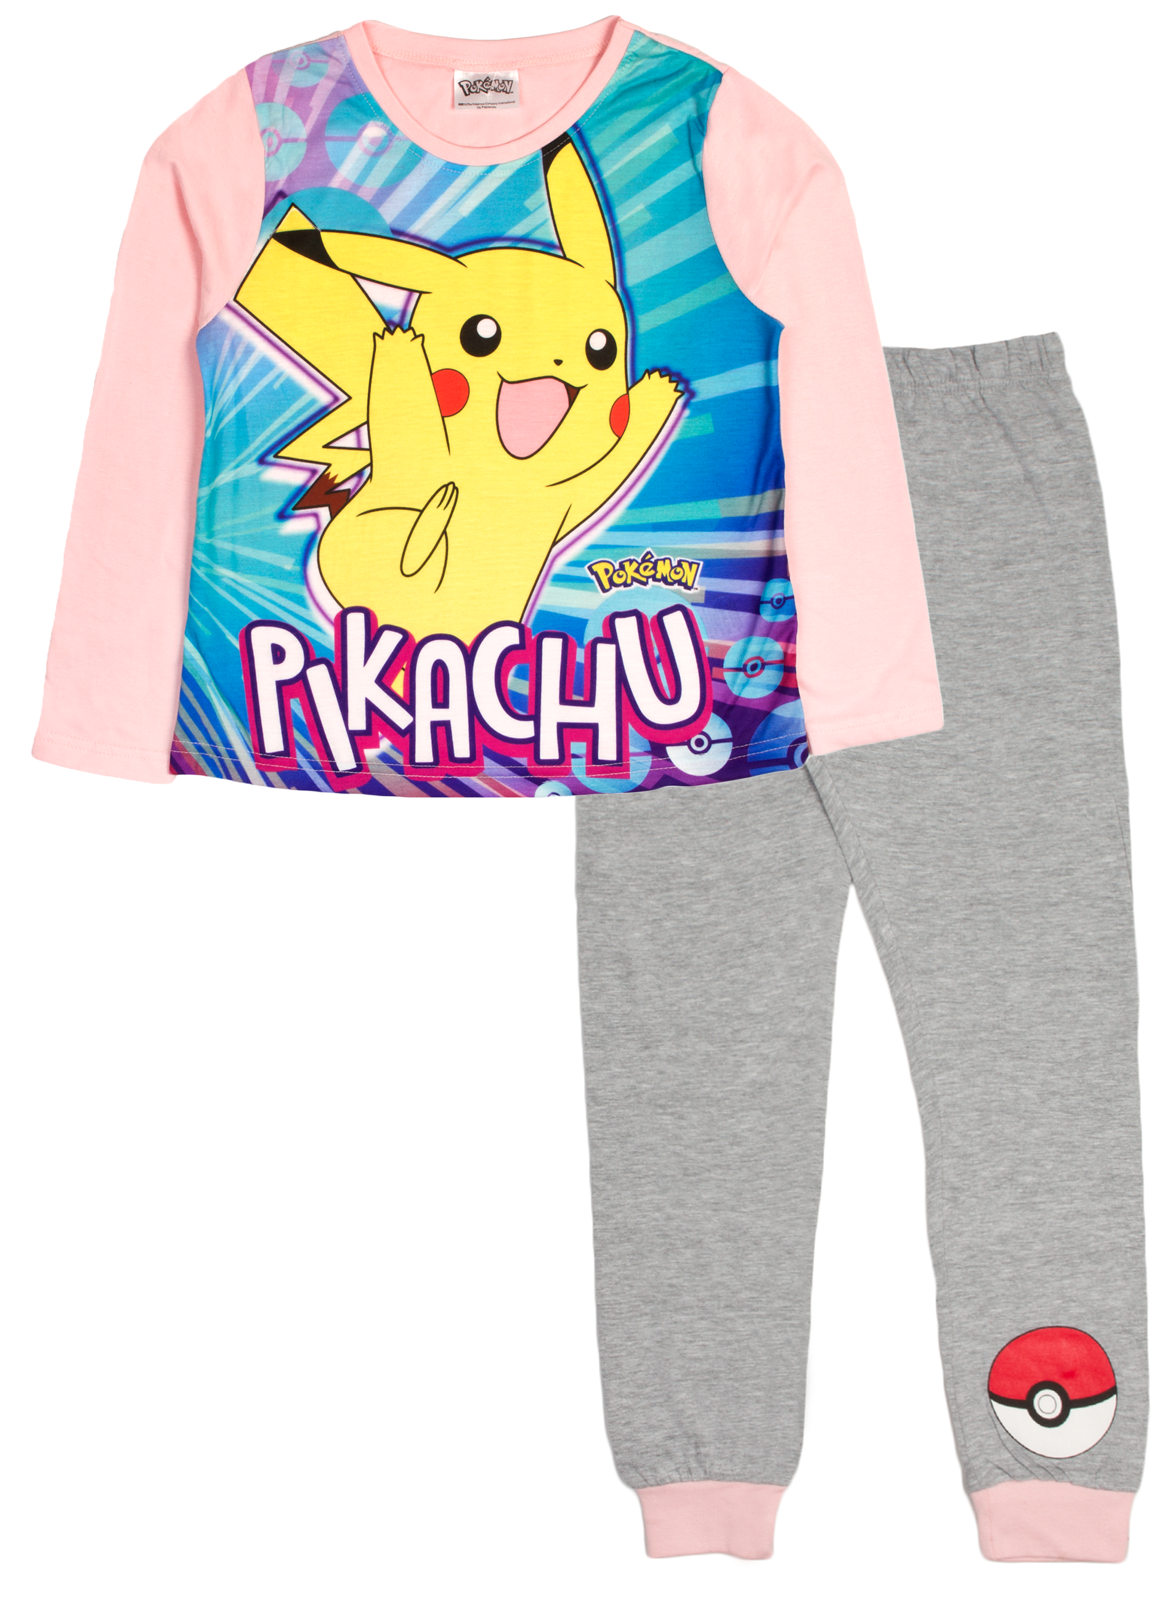 5d29b74022 Girls Pokemon Go Pyjamas Full Length Pikachu Pjs 2 Piece Pyjama Set Kids  Size